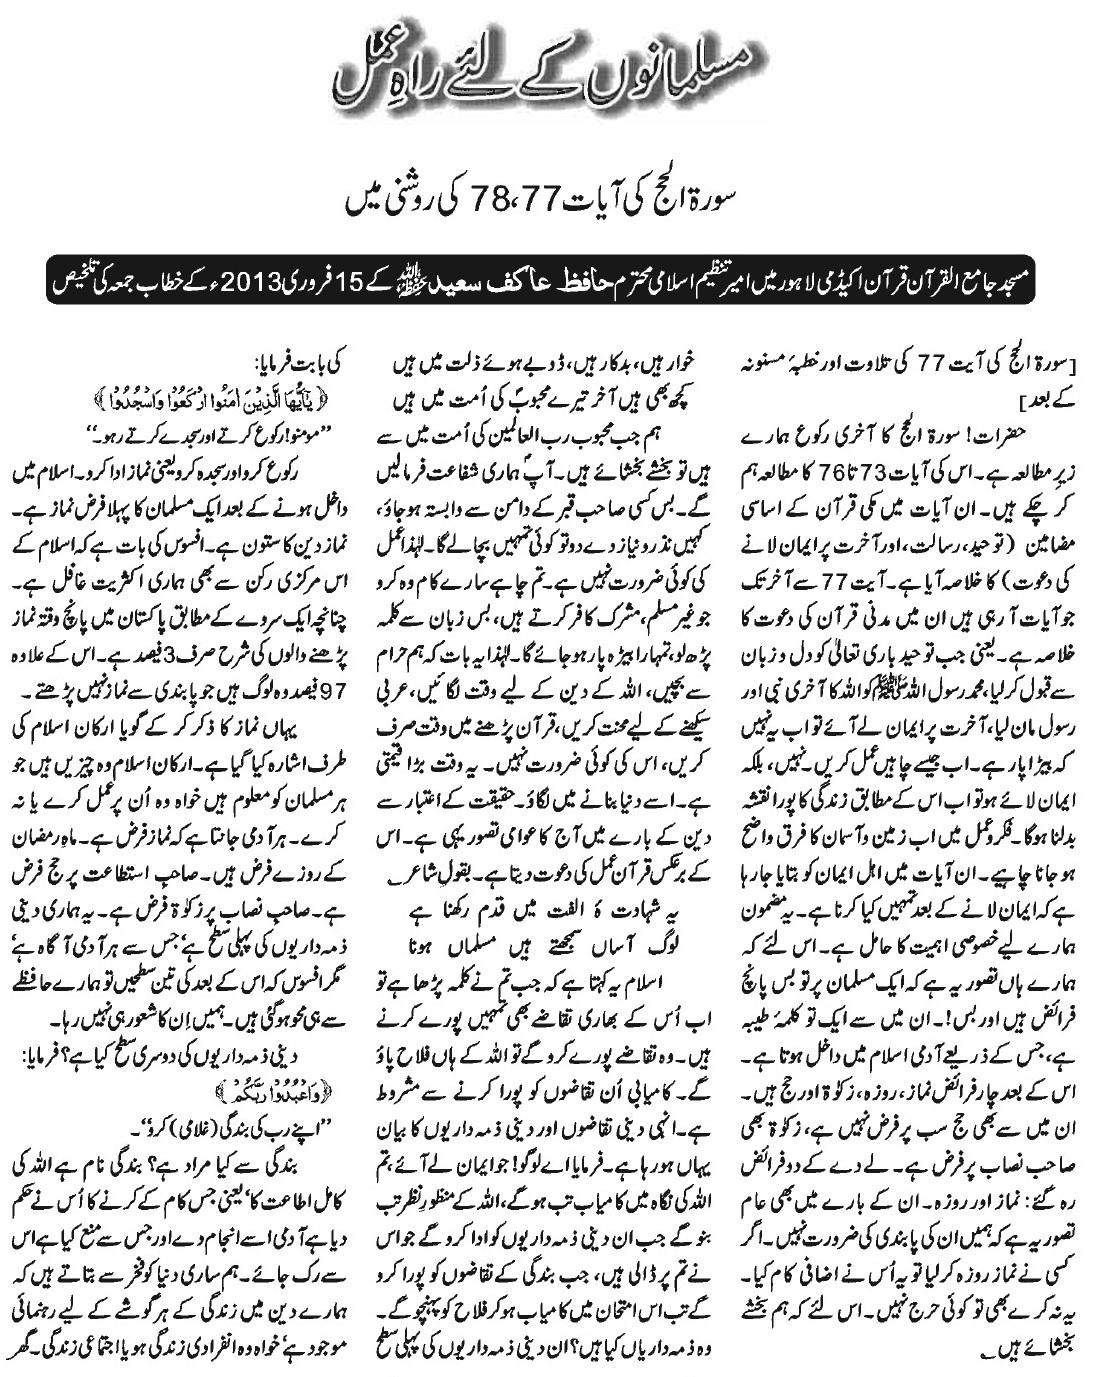 Essay on maulana mohammad ali johar in urdu